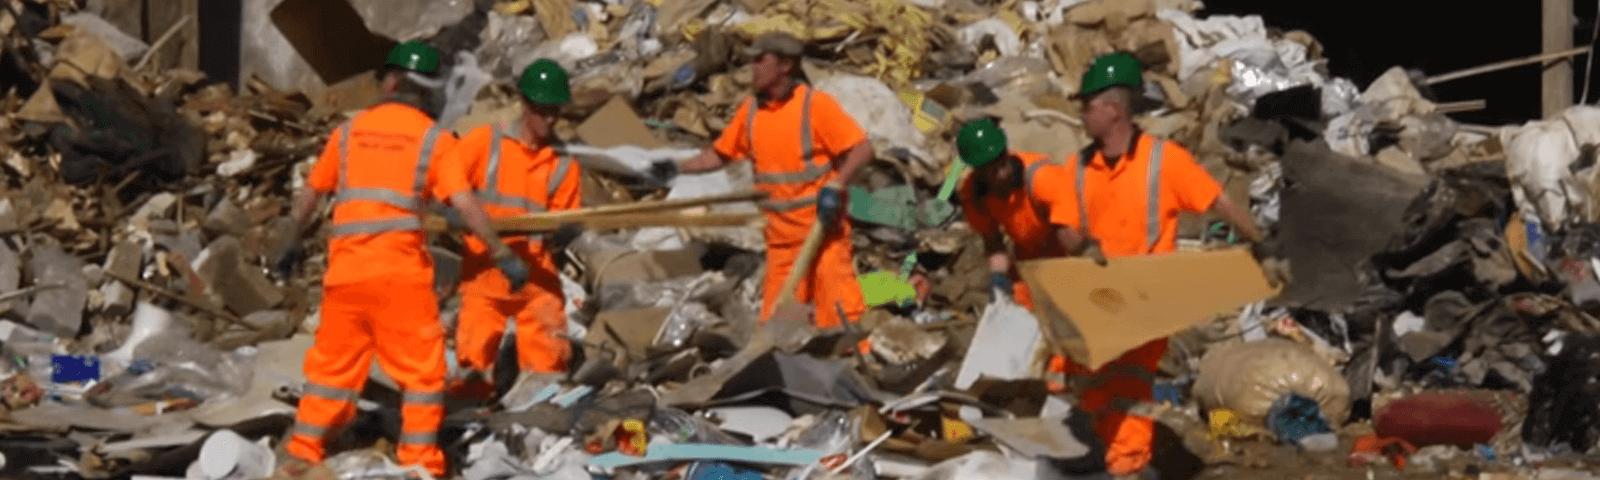 West-Bromwich-waste-skip-1